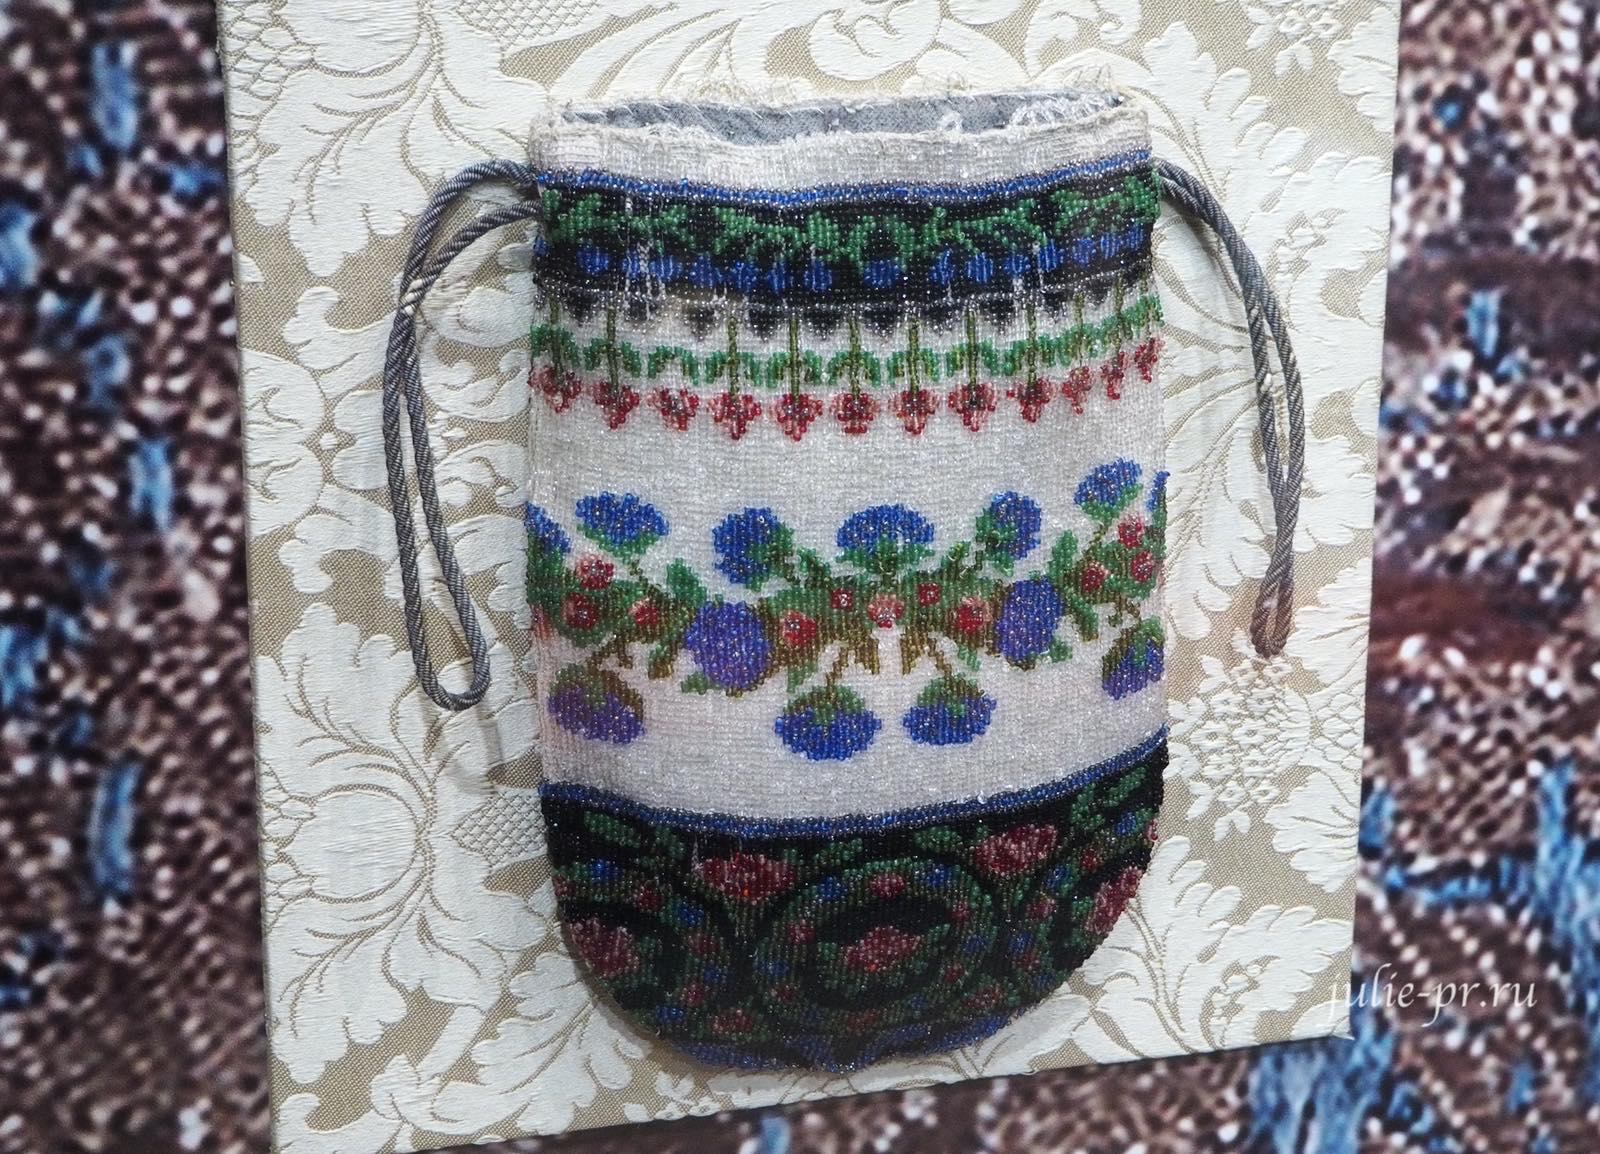 Сумочка (Россия, XIX век): вышивка бисером